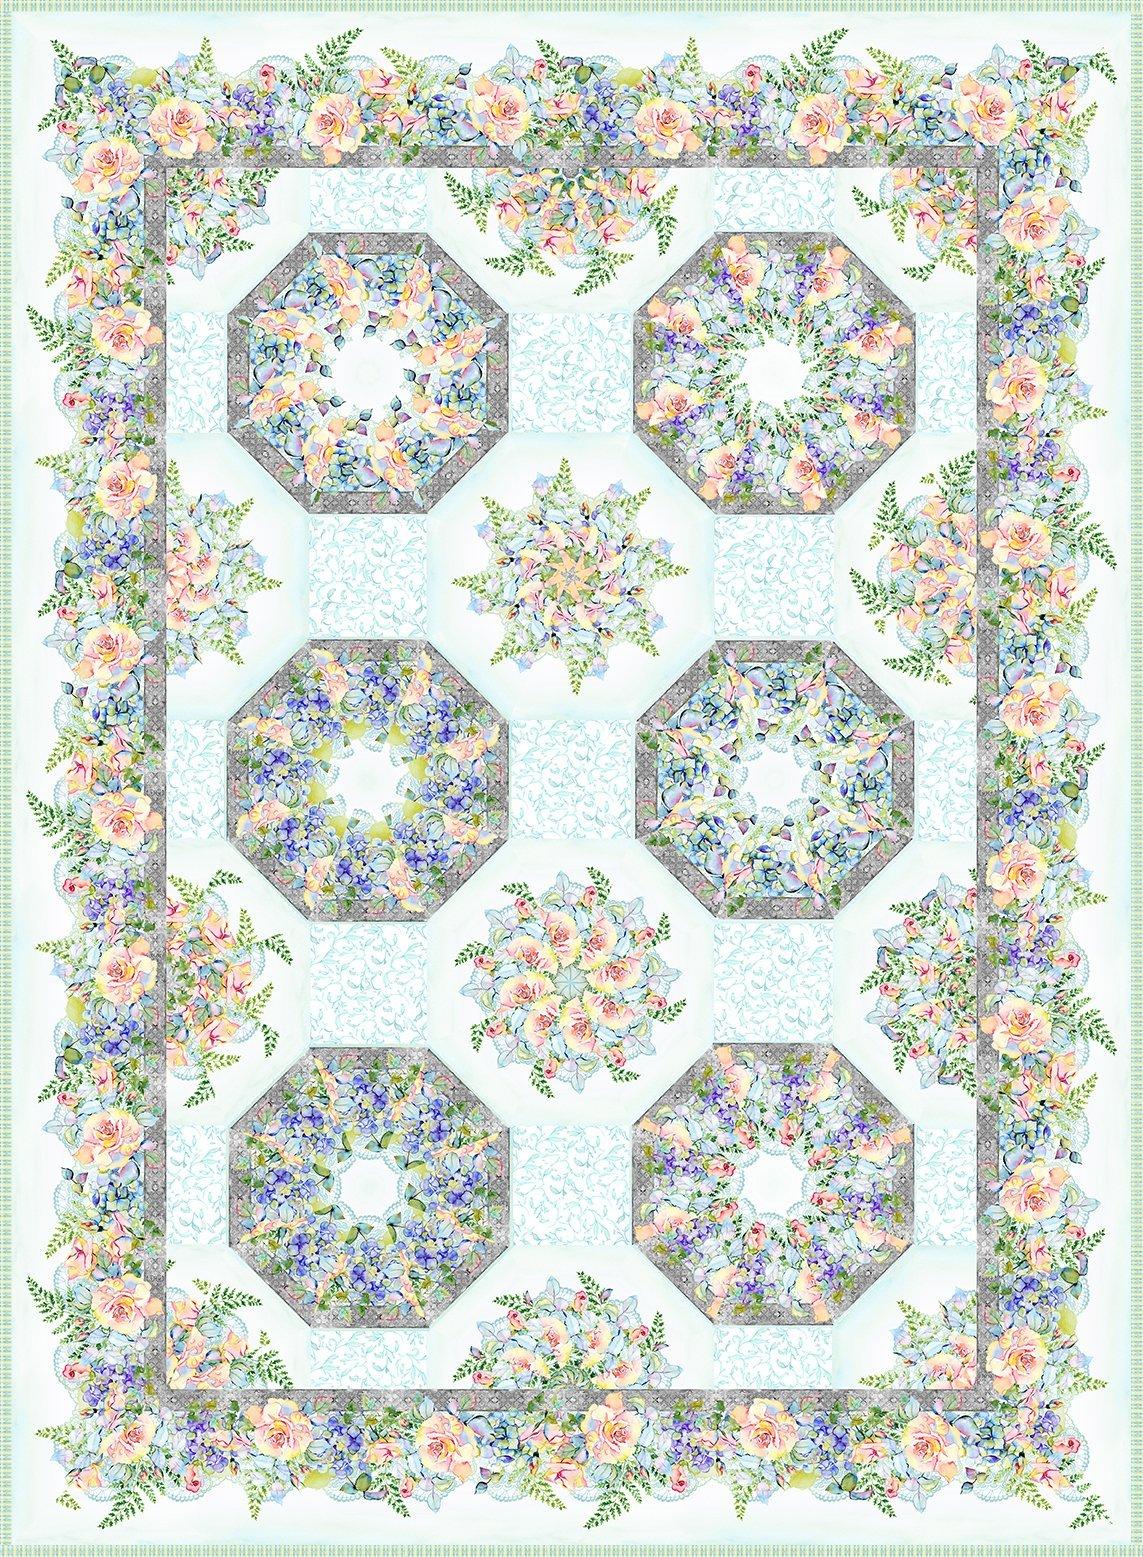 Patricia Kaleidoscope  Kit 64 x 86.5